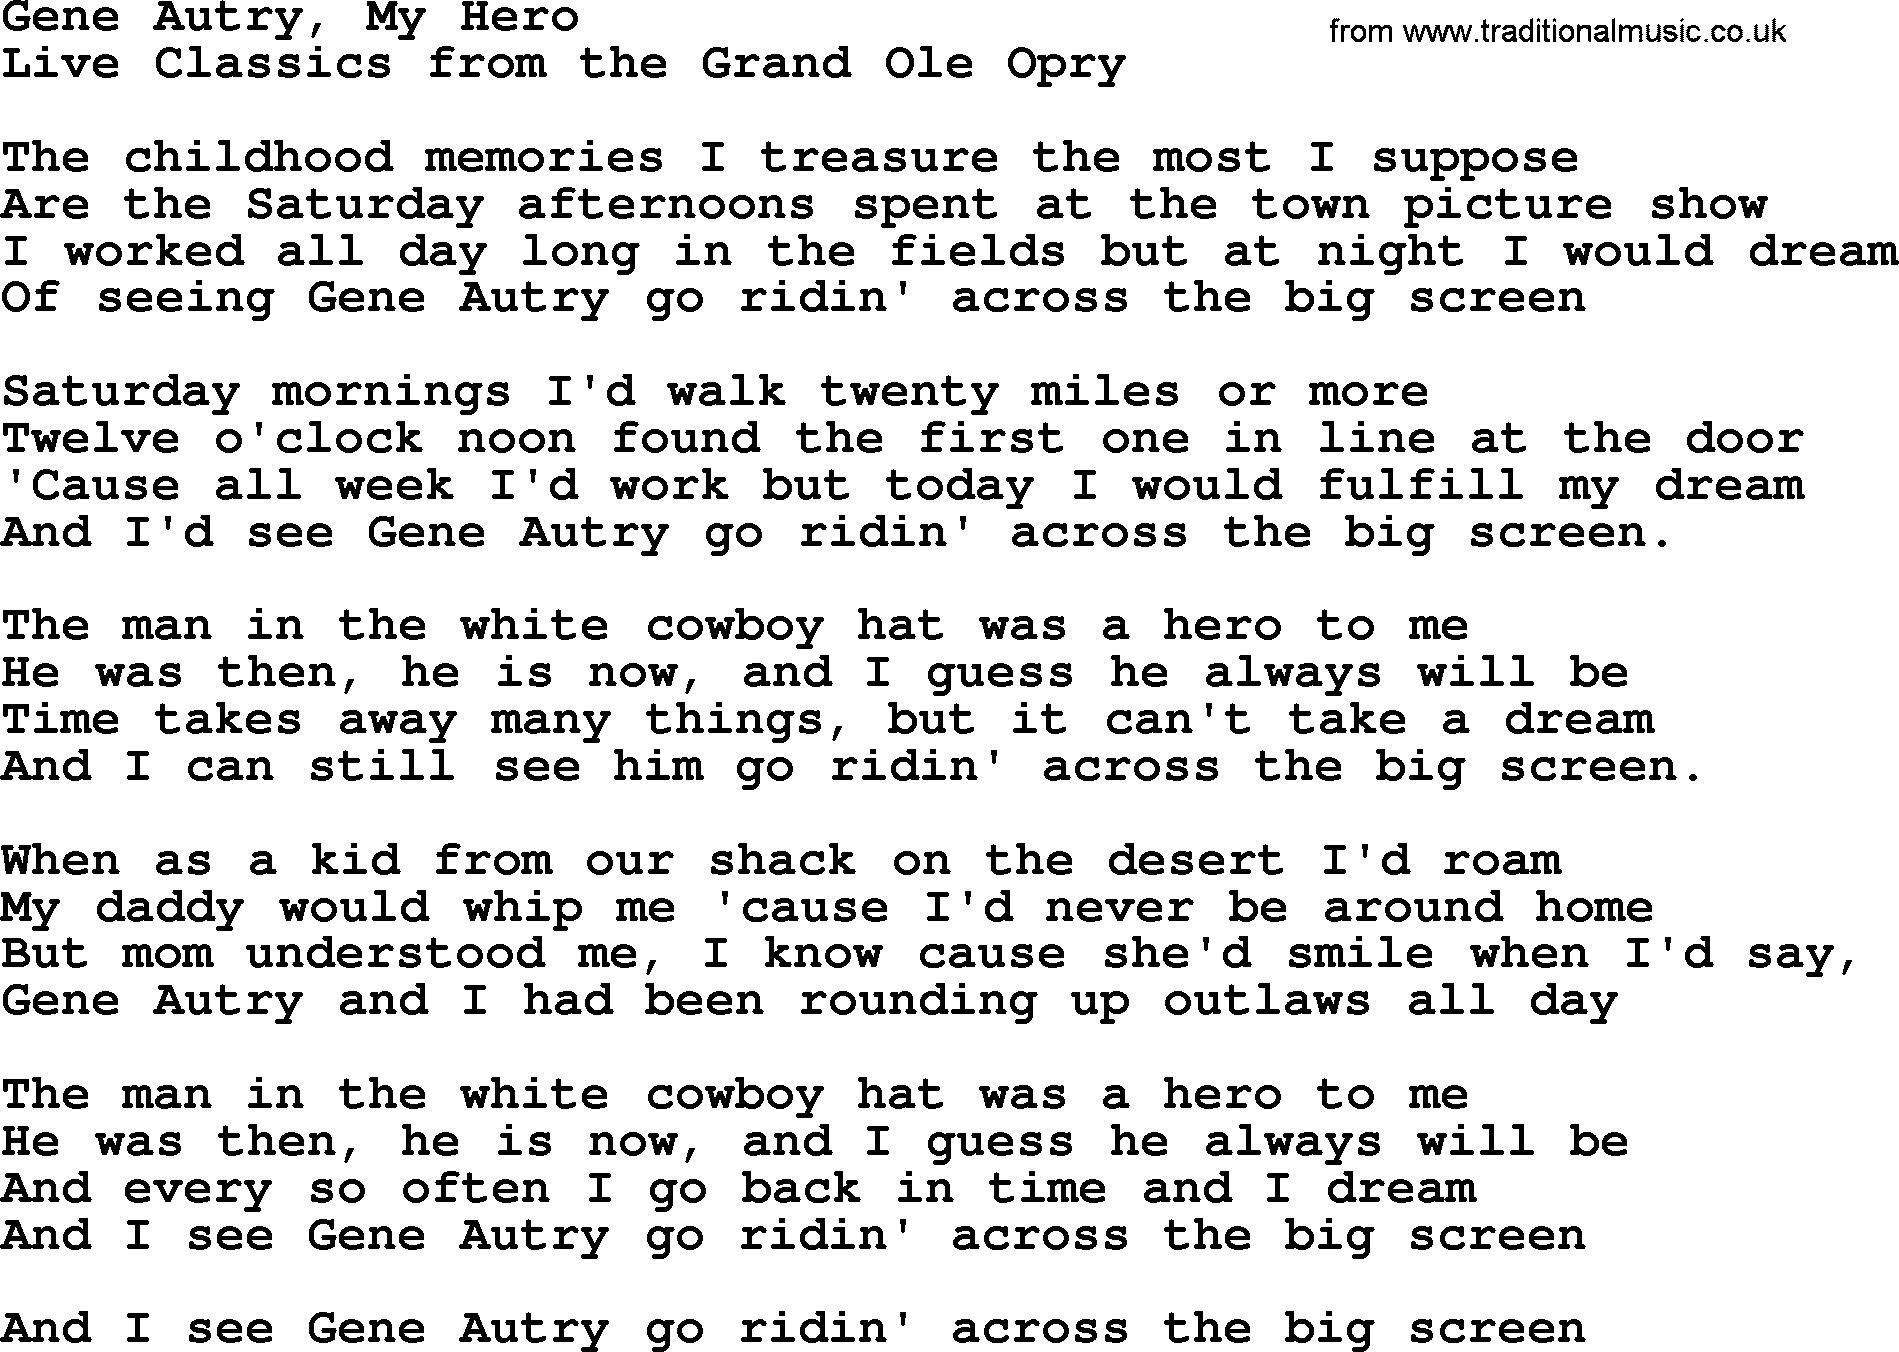 Gene Autry My Hero, by Marty Robbins - lyrics